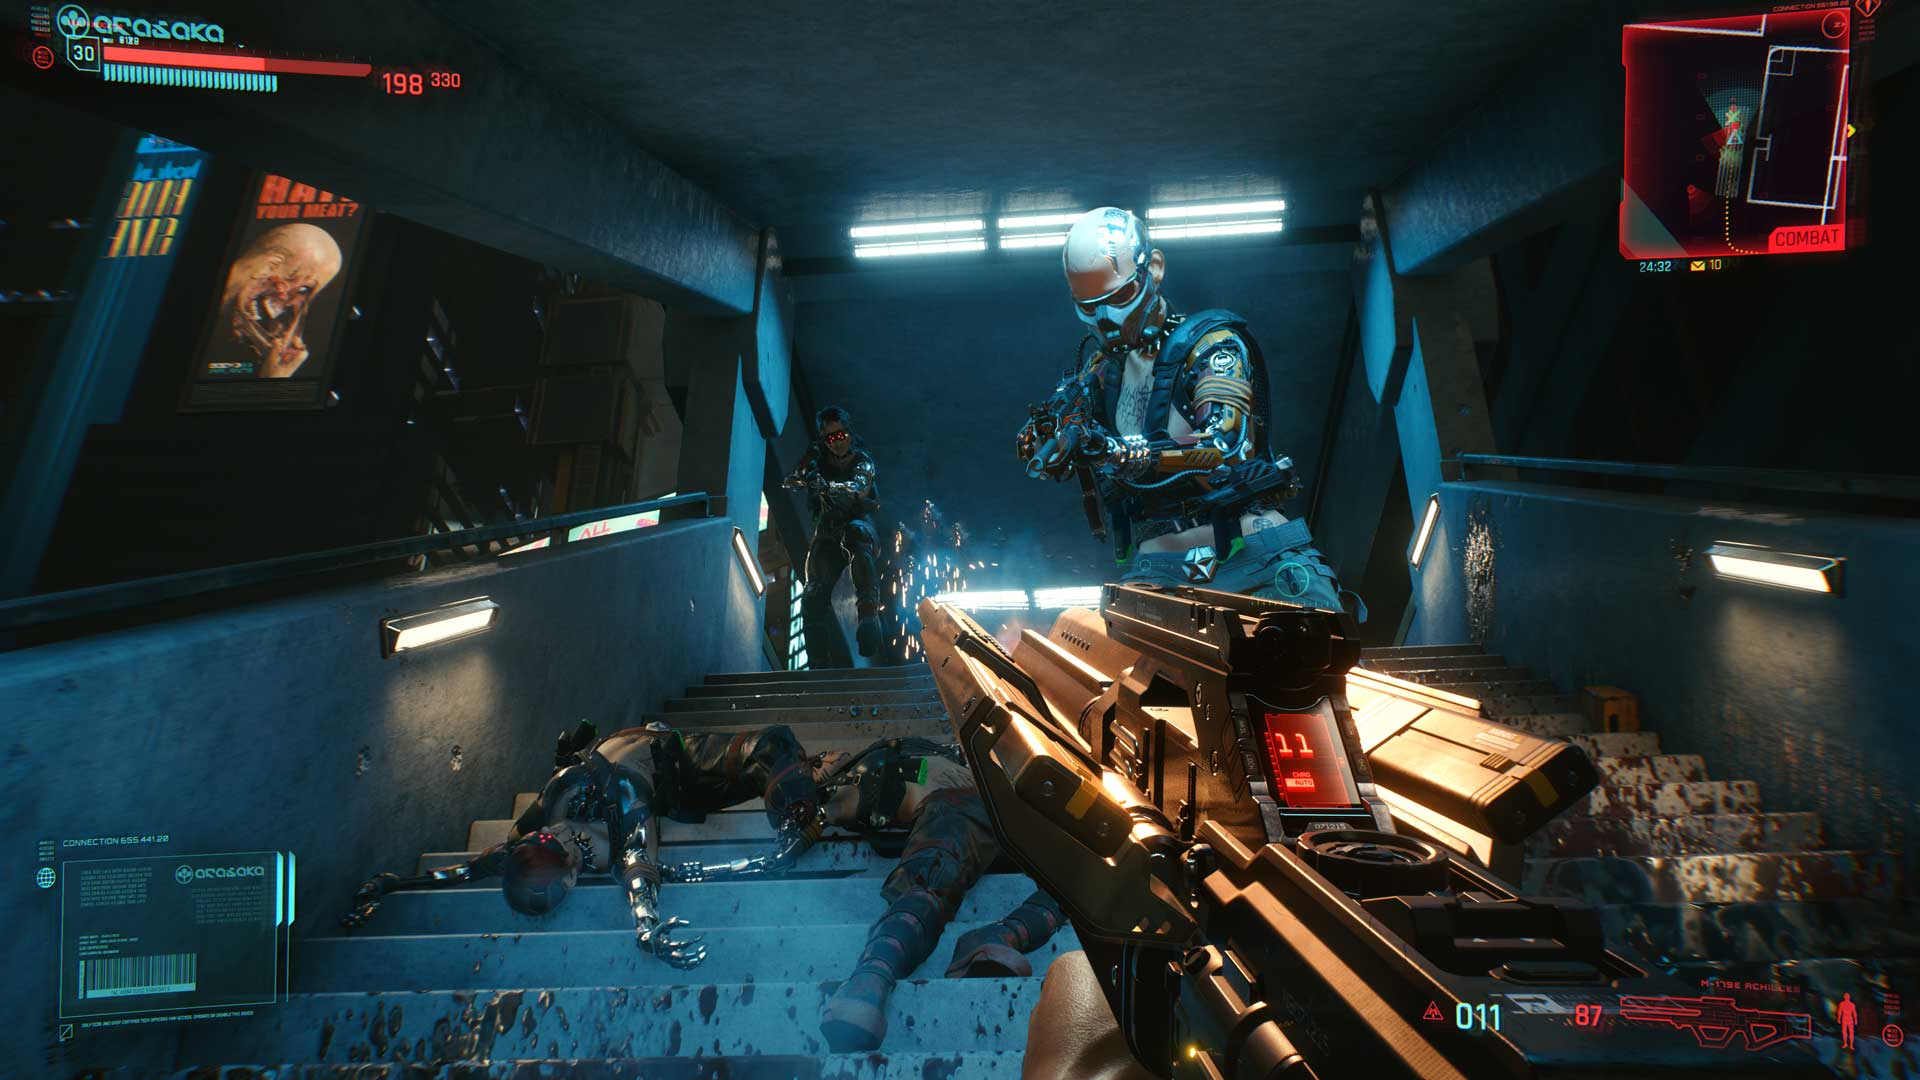 Schussgefecht in Cyberpunk 2077